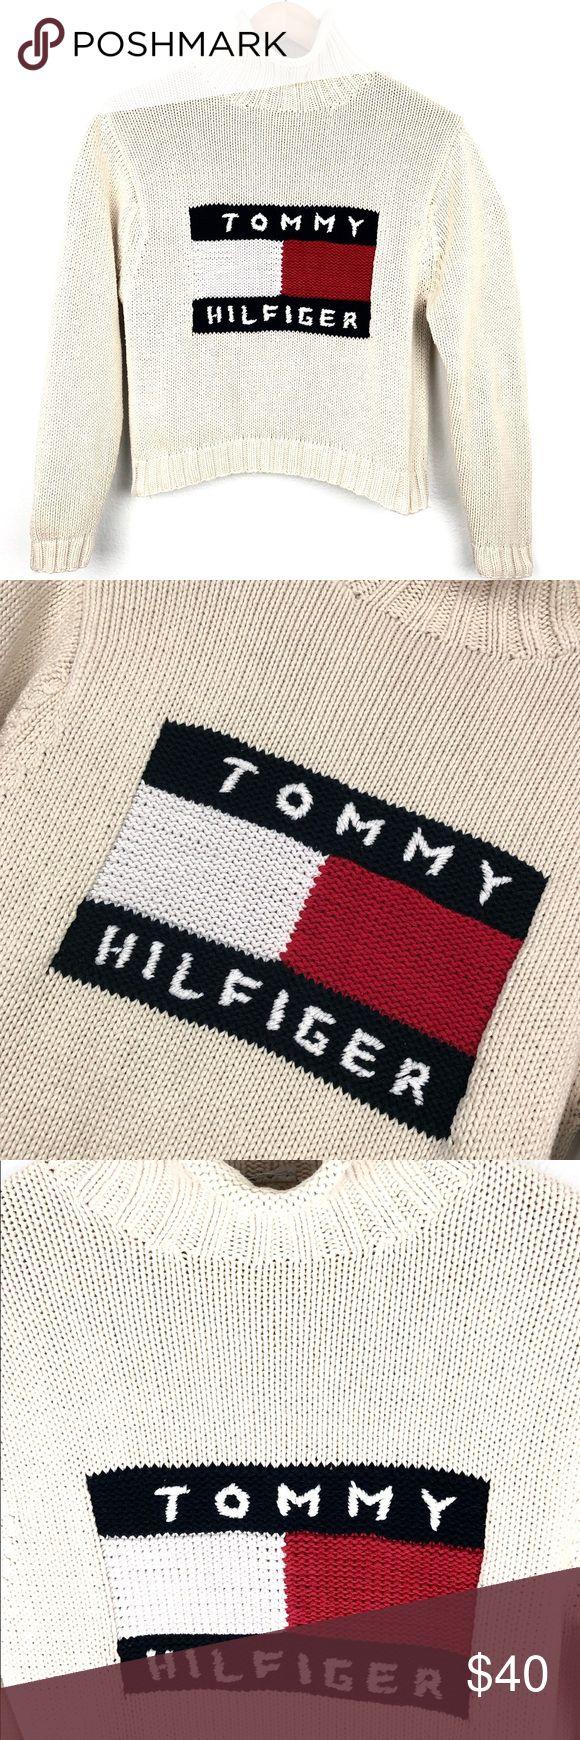 Vintage Tommy Hilfiger turtleneck sweater knit Vintage Tommy Hilfiger turtleneck sweater knit cream color Tommy flag.  👁🗨Size No size availab...